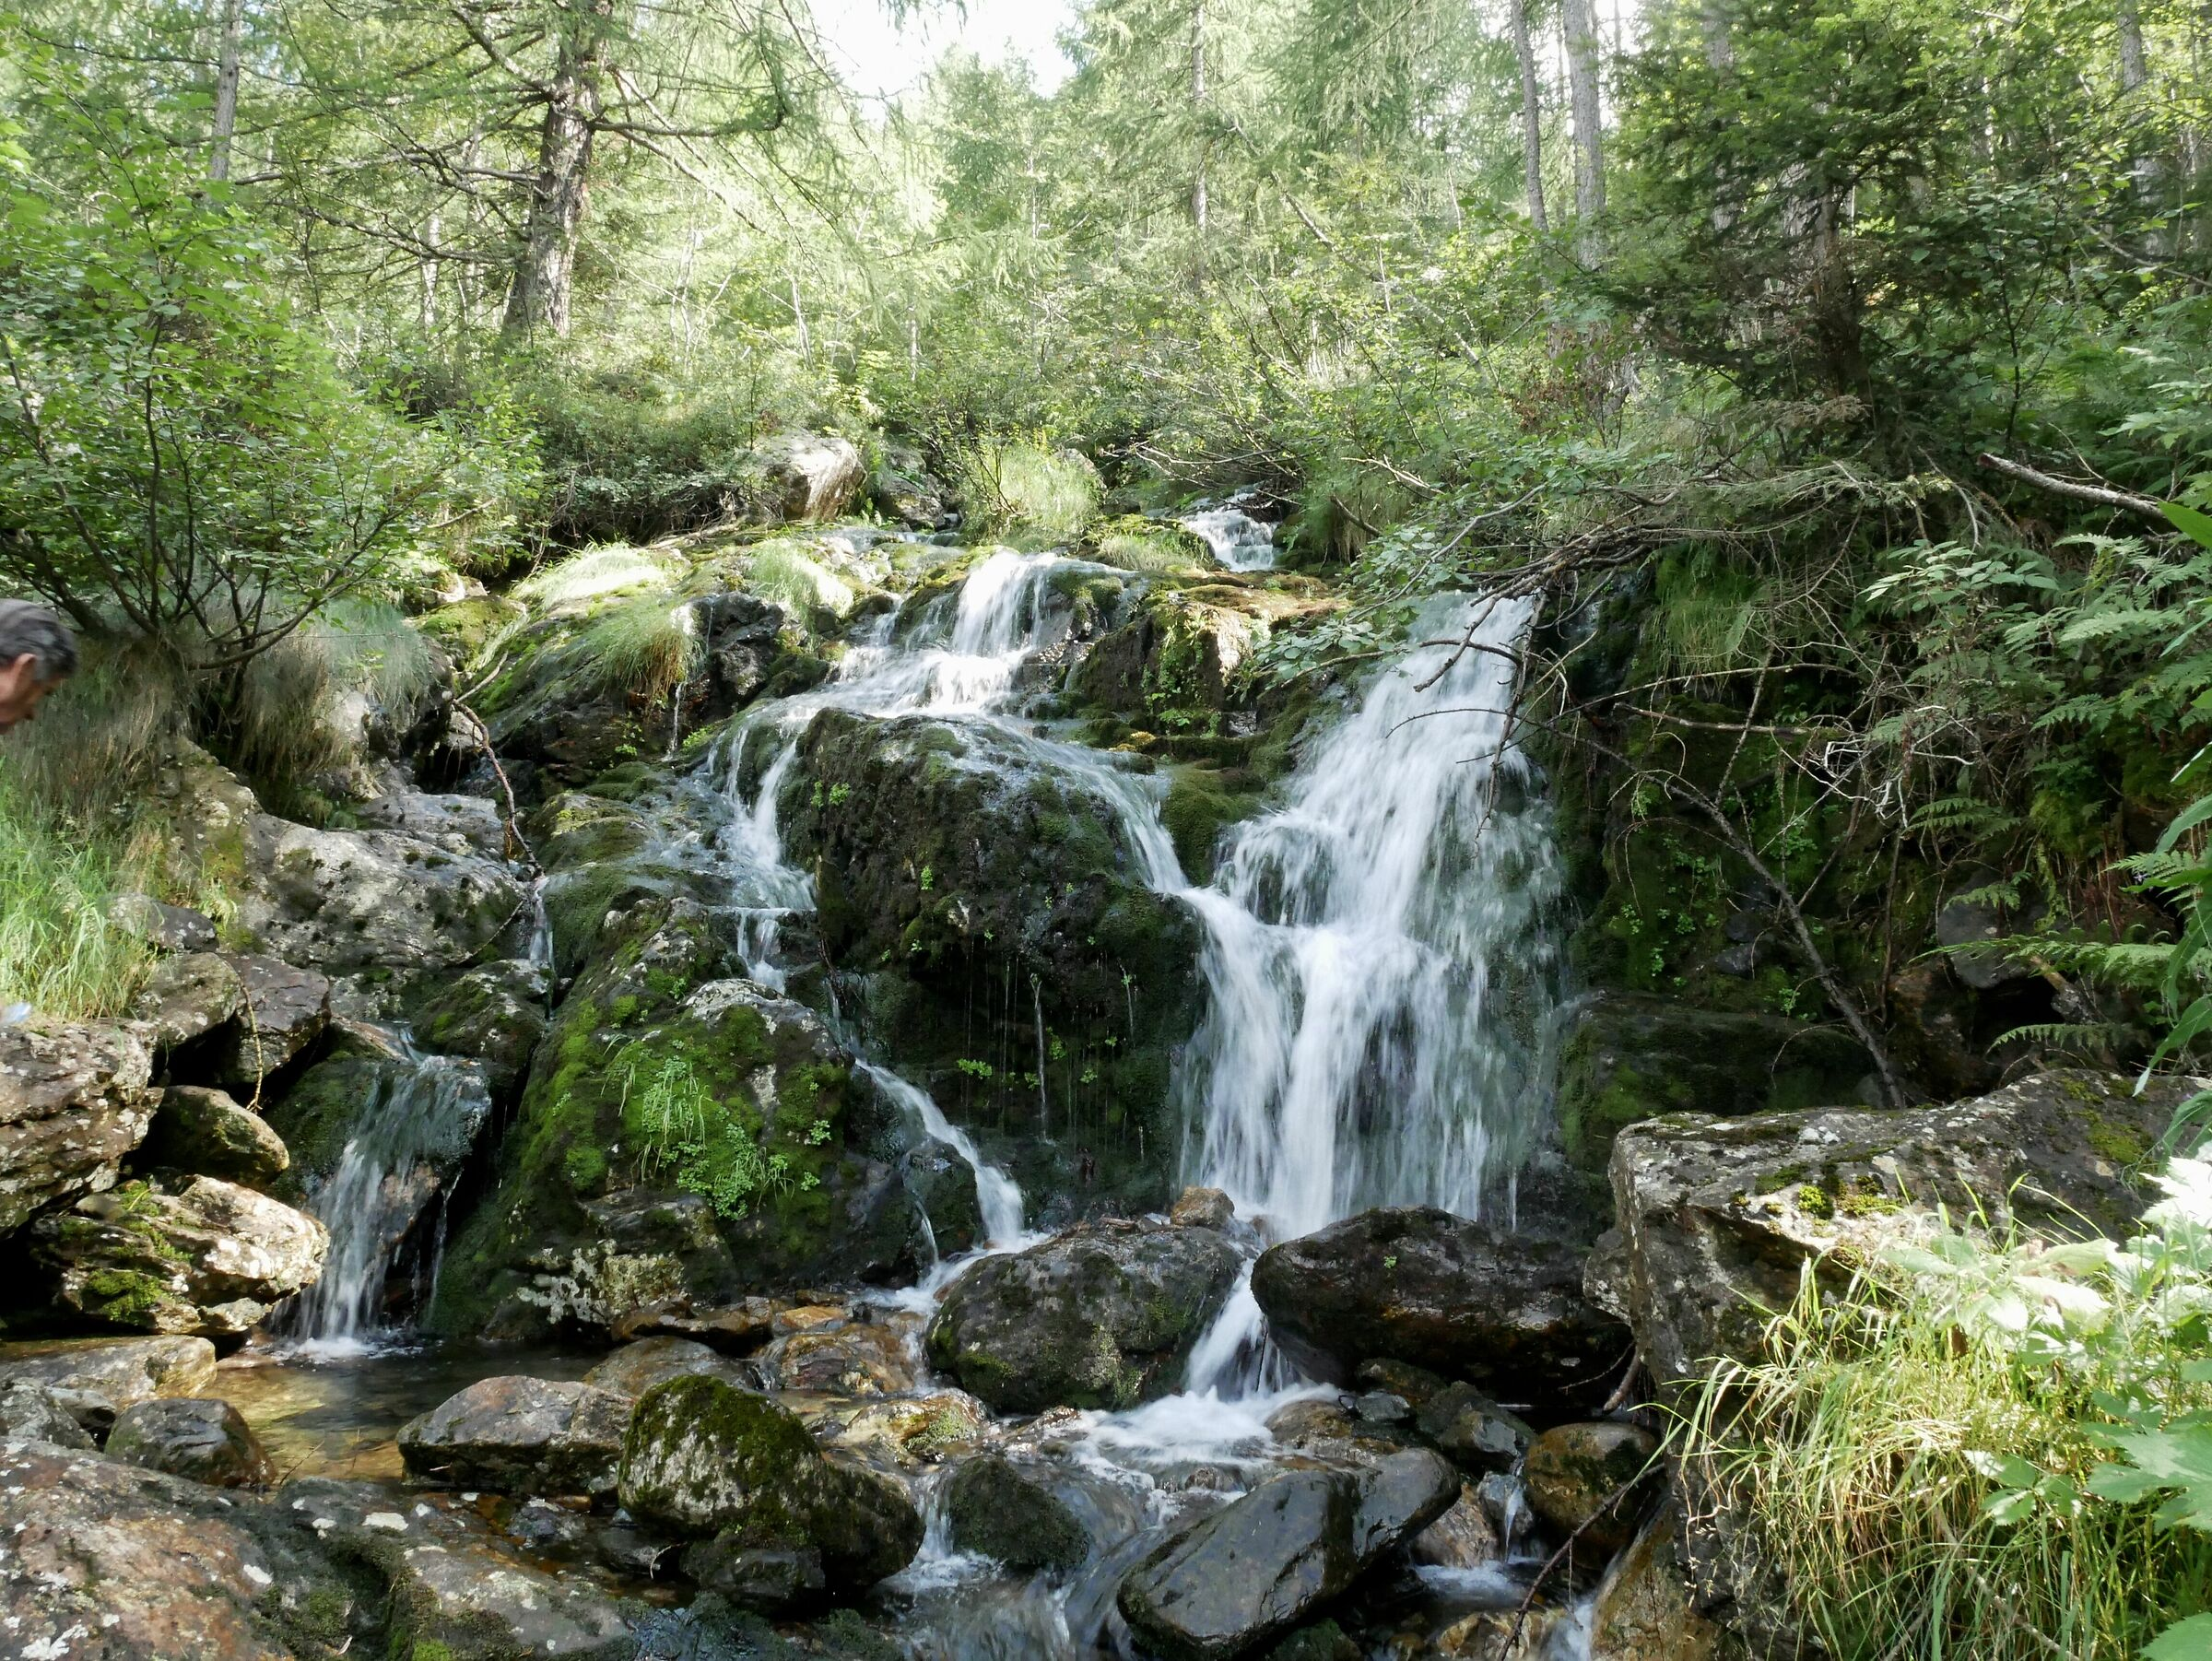 Water is smart, pragmatic, efficient...